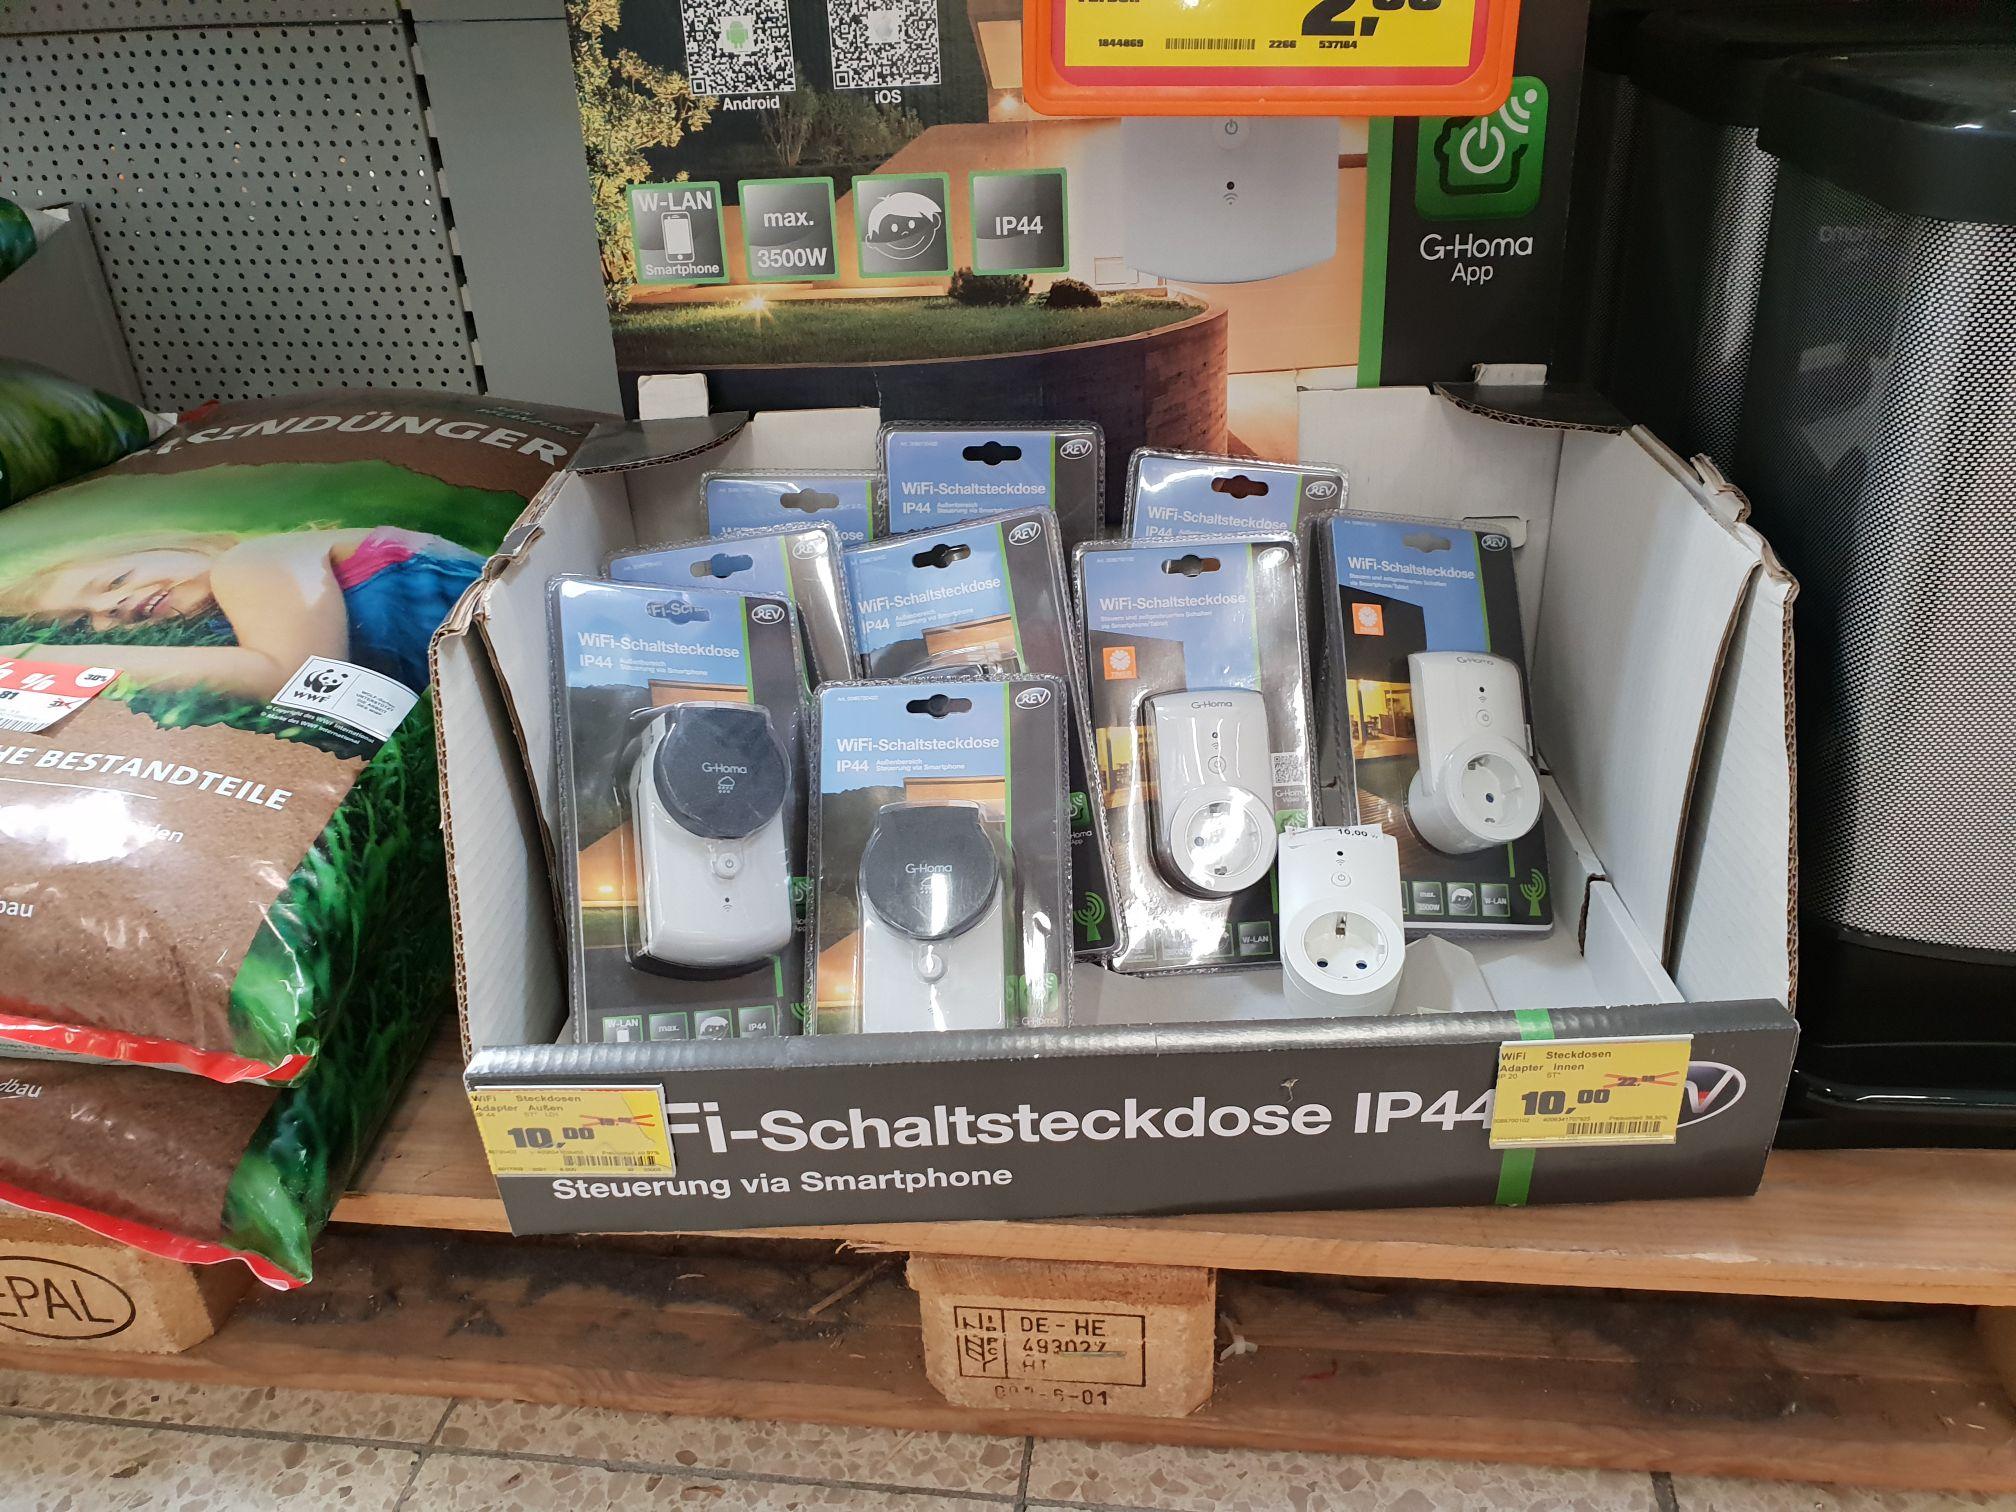 [Lokal] OBI Bad Oeynhausen - G-Homa Wifi Außensteckdose IP44